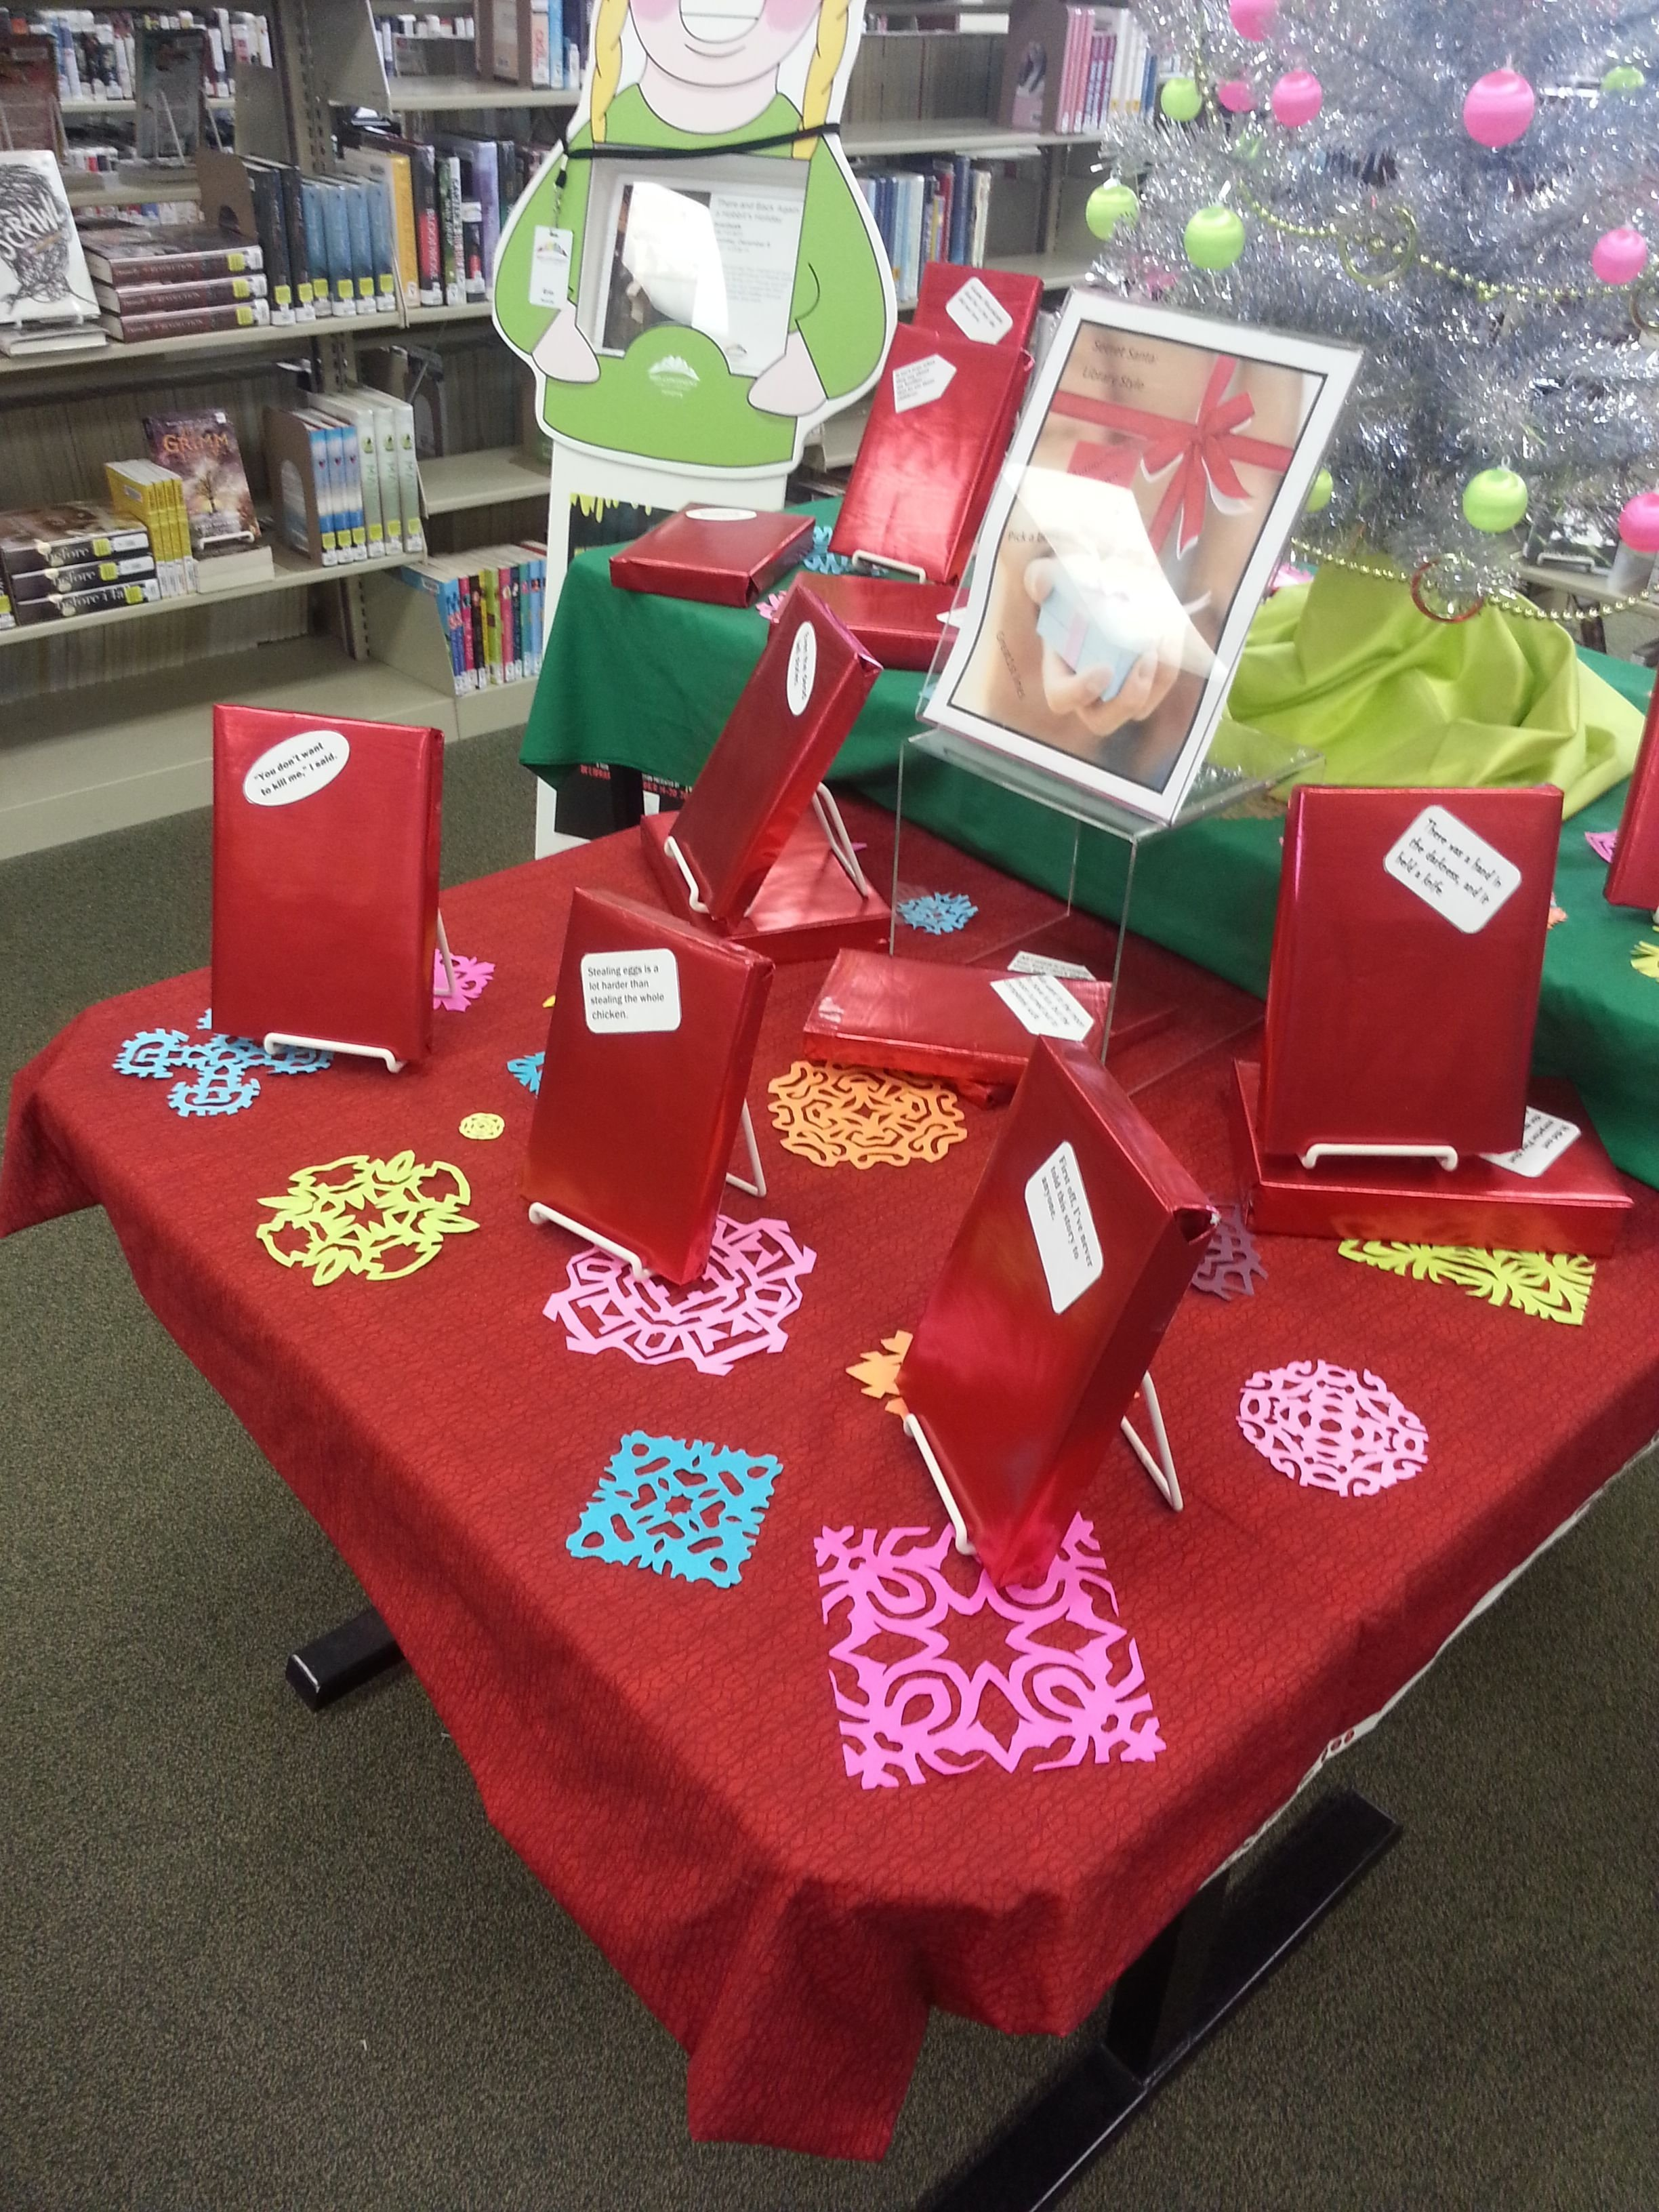 10 Fantastic Secret Santa Ideas For School secret santa first lines display wrapped books leaving just 2020